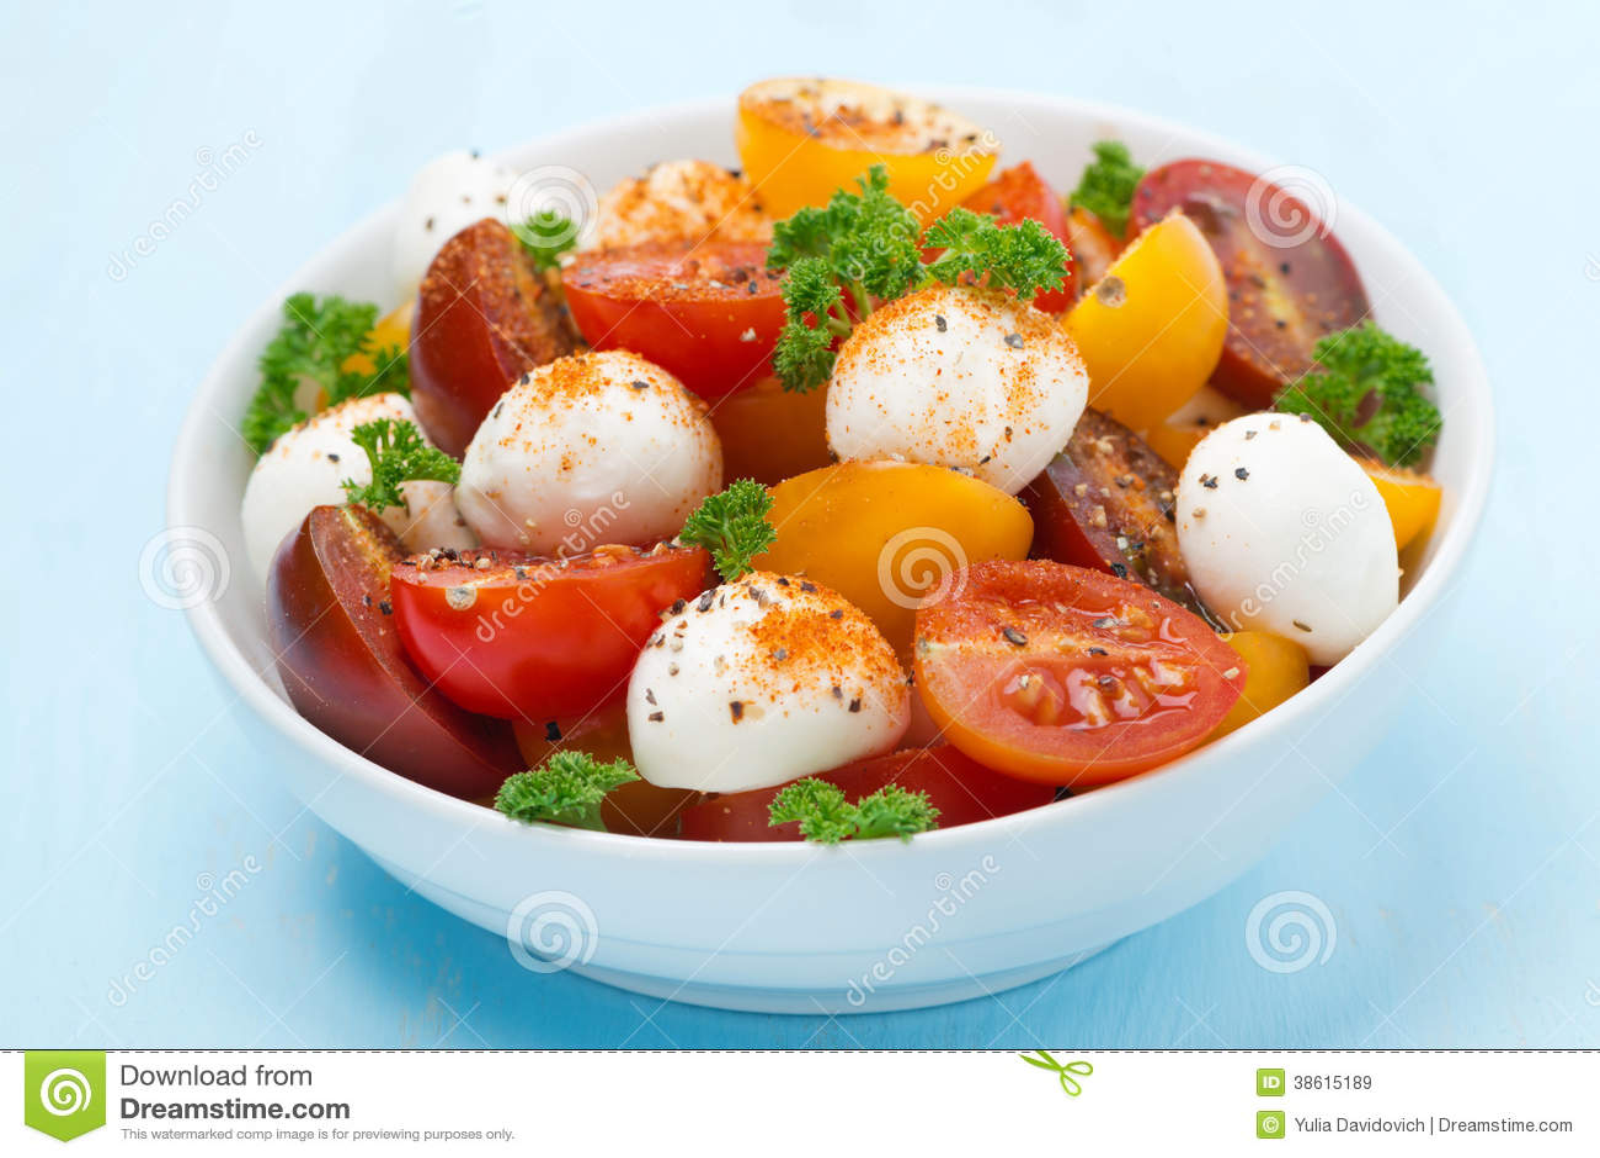 bol de salade avec du mozzarella tomates cerises image stock image du mozzarella herbe 38615189. Black Bedroom Furniture Sets. Home Design Ideas